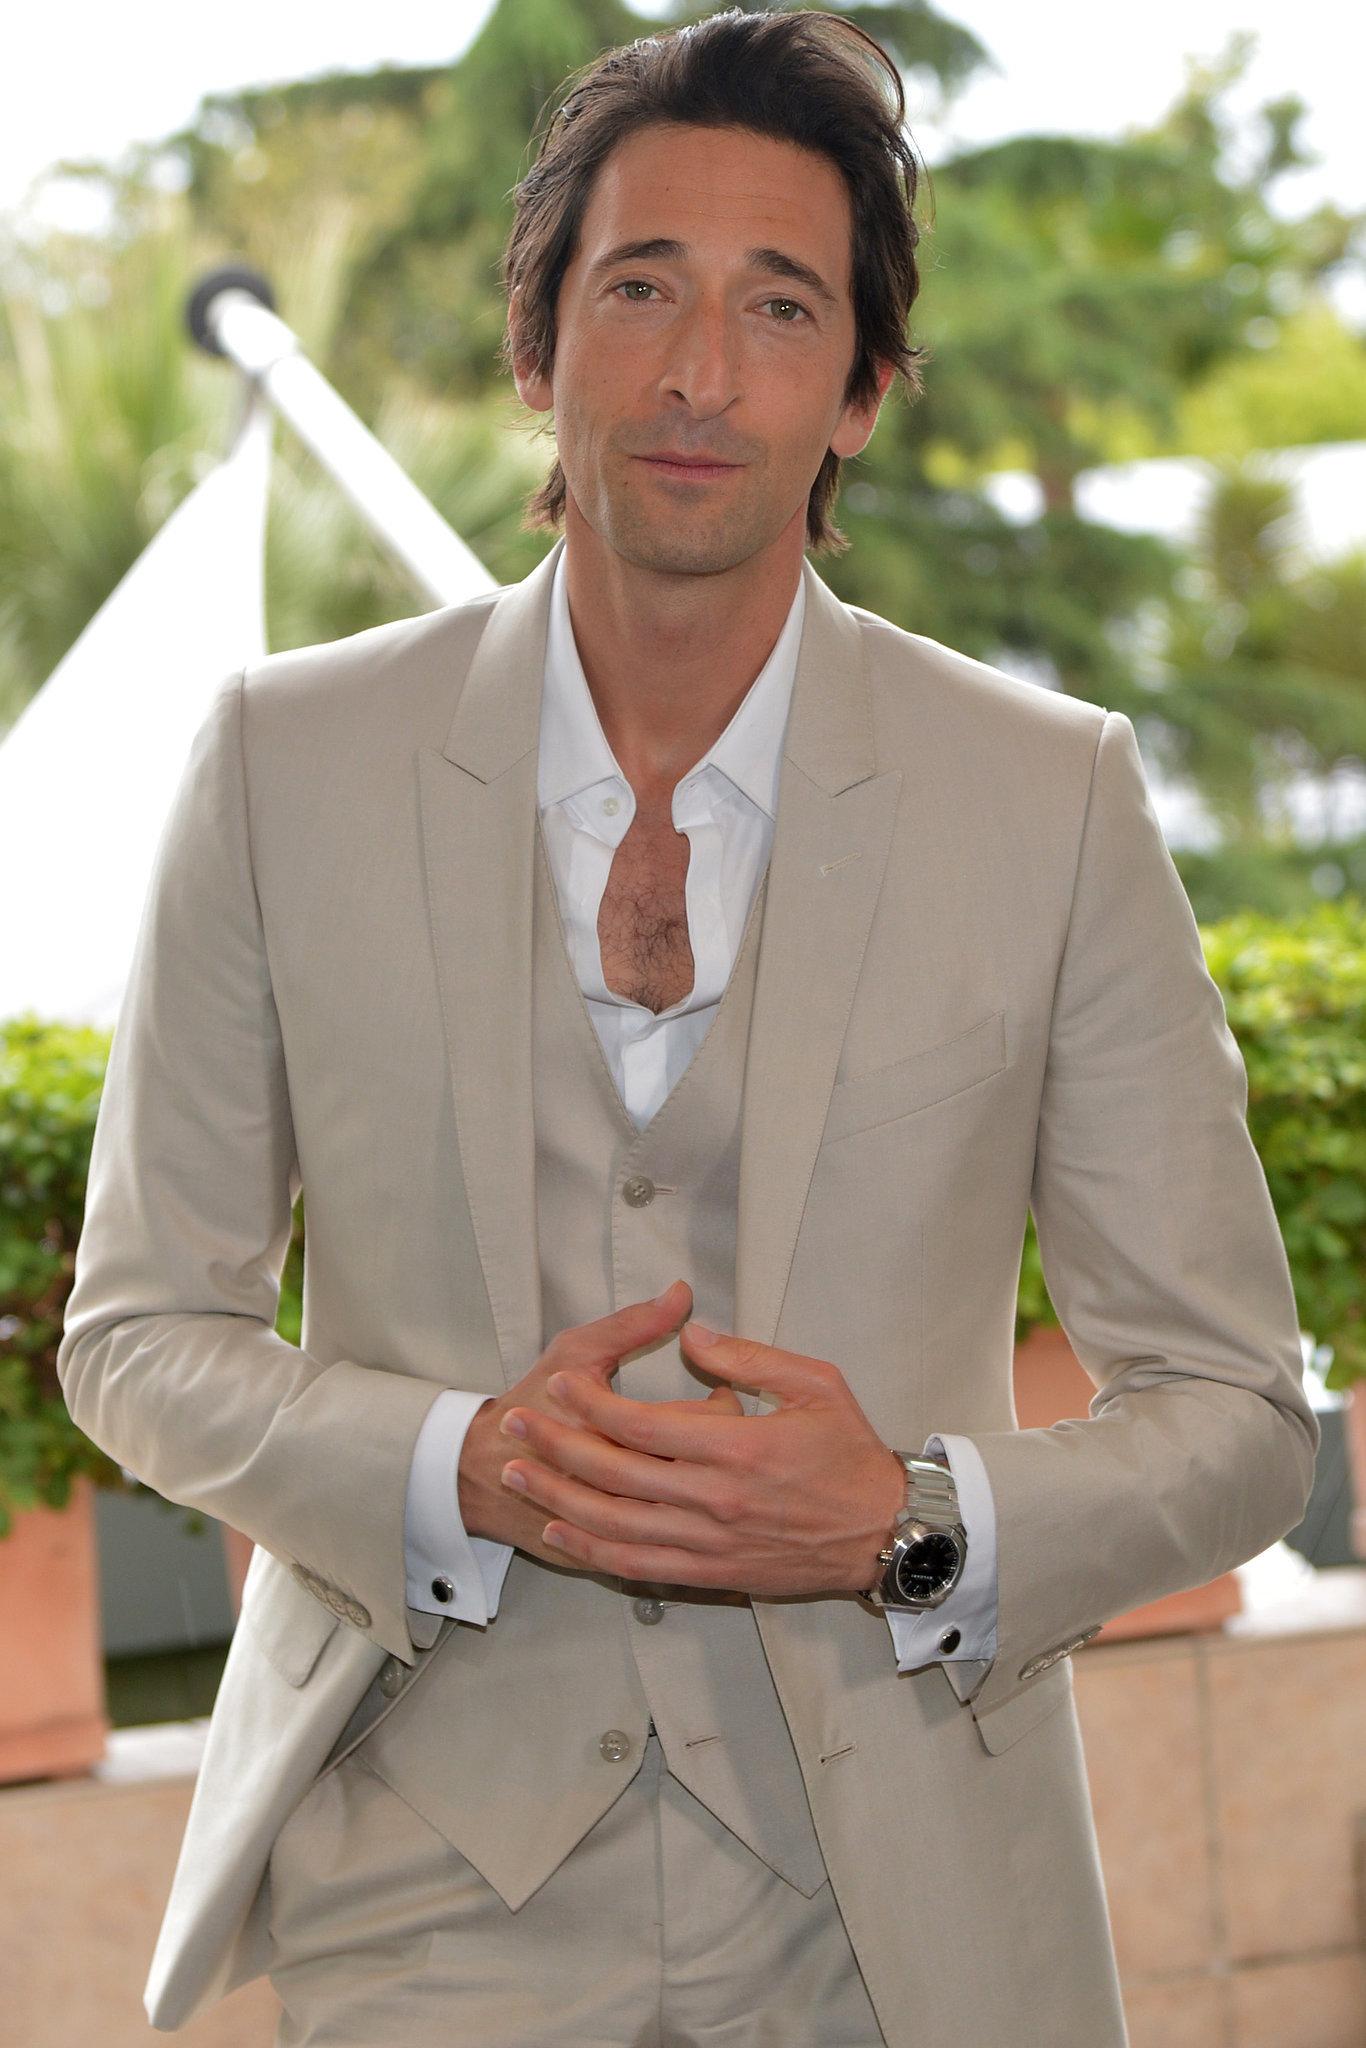 Adrien Brody will star in Emperor, as 16th century Emperor Charles V.